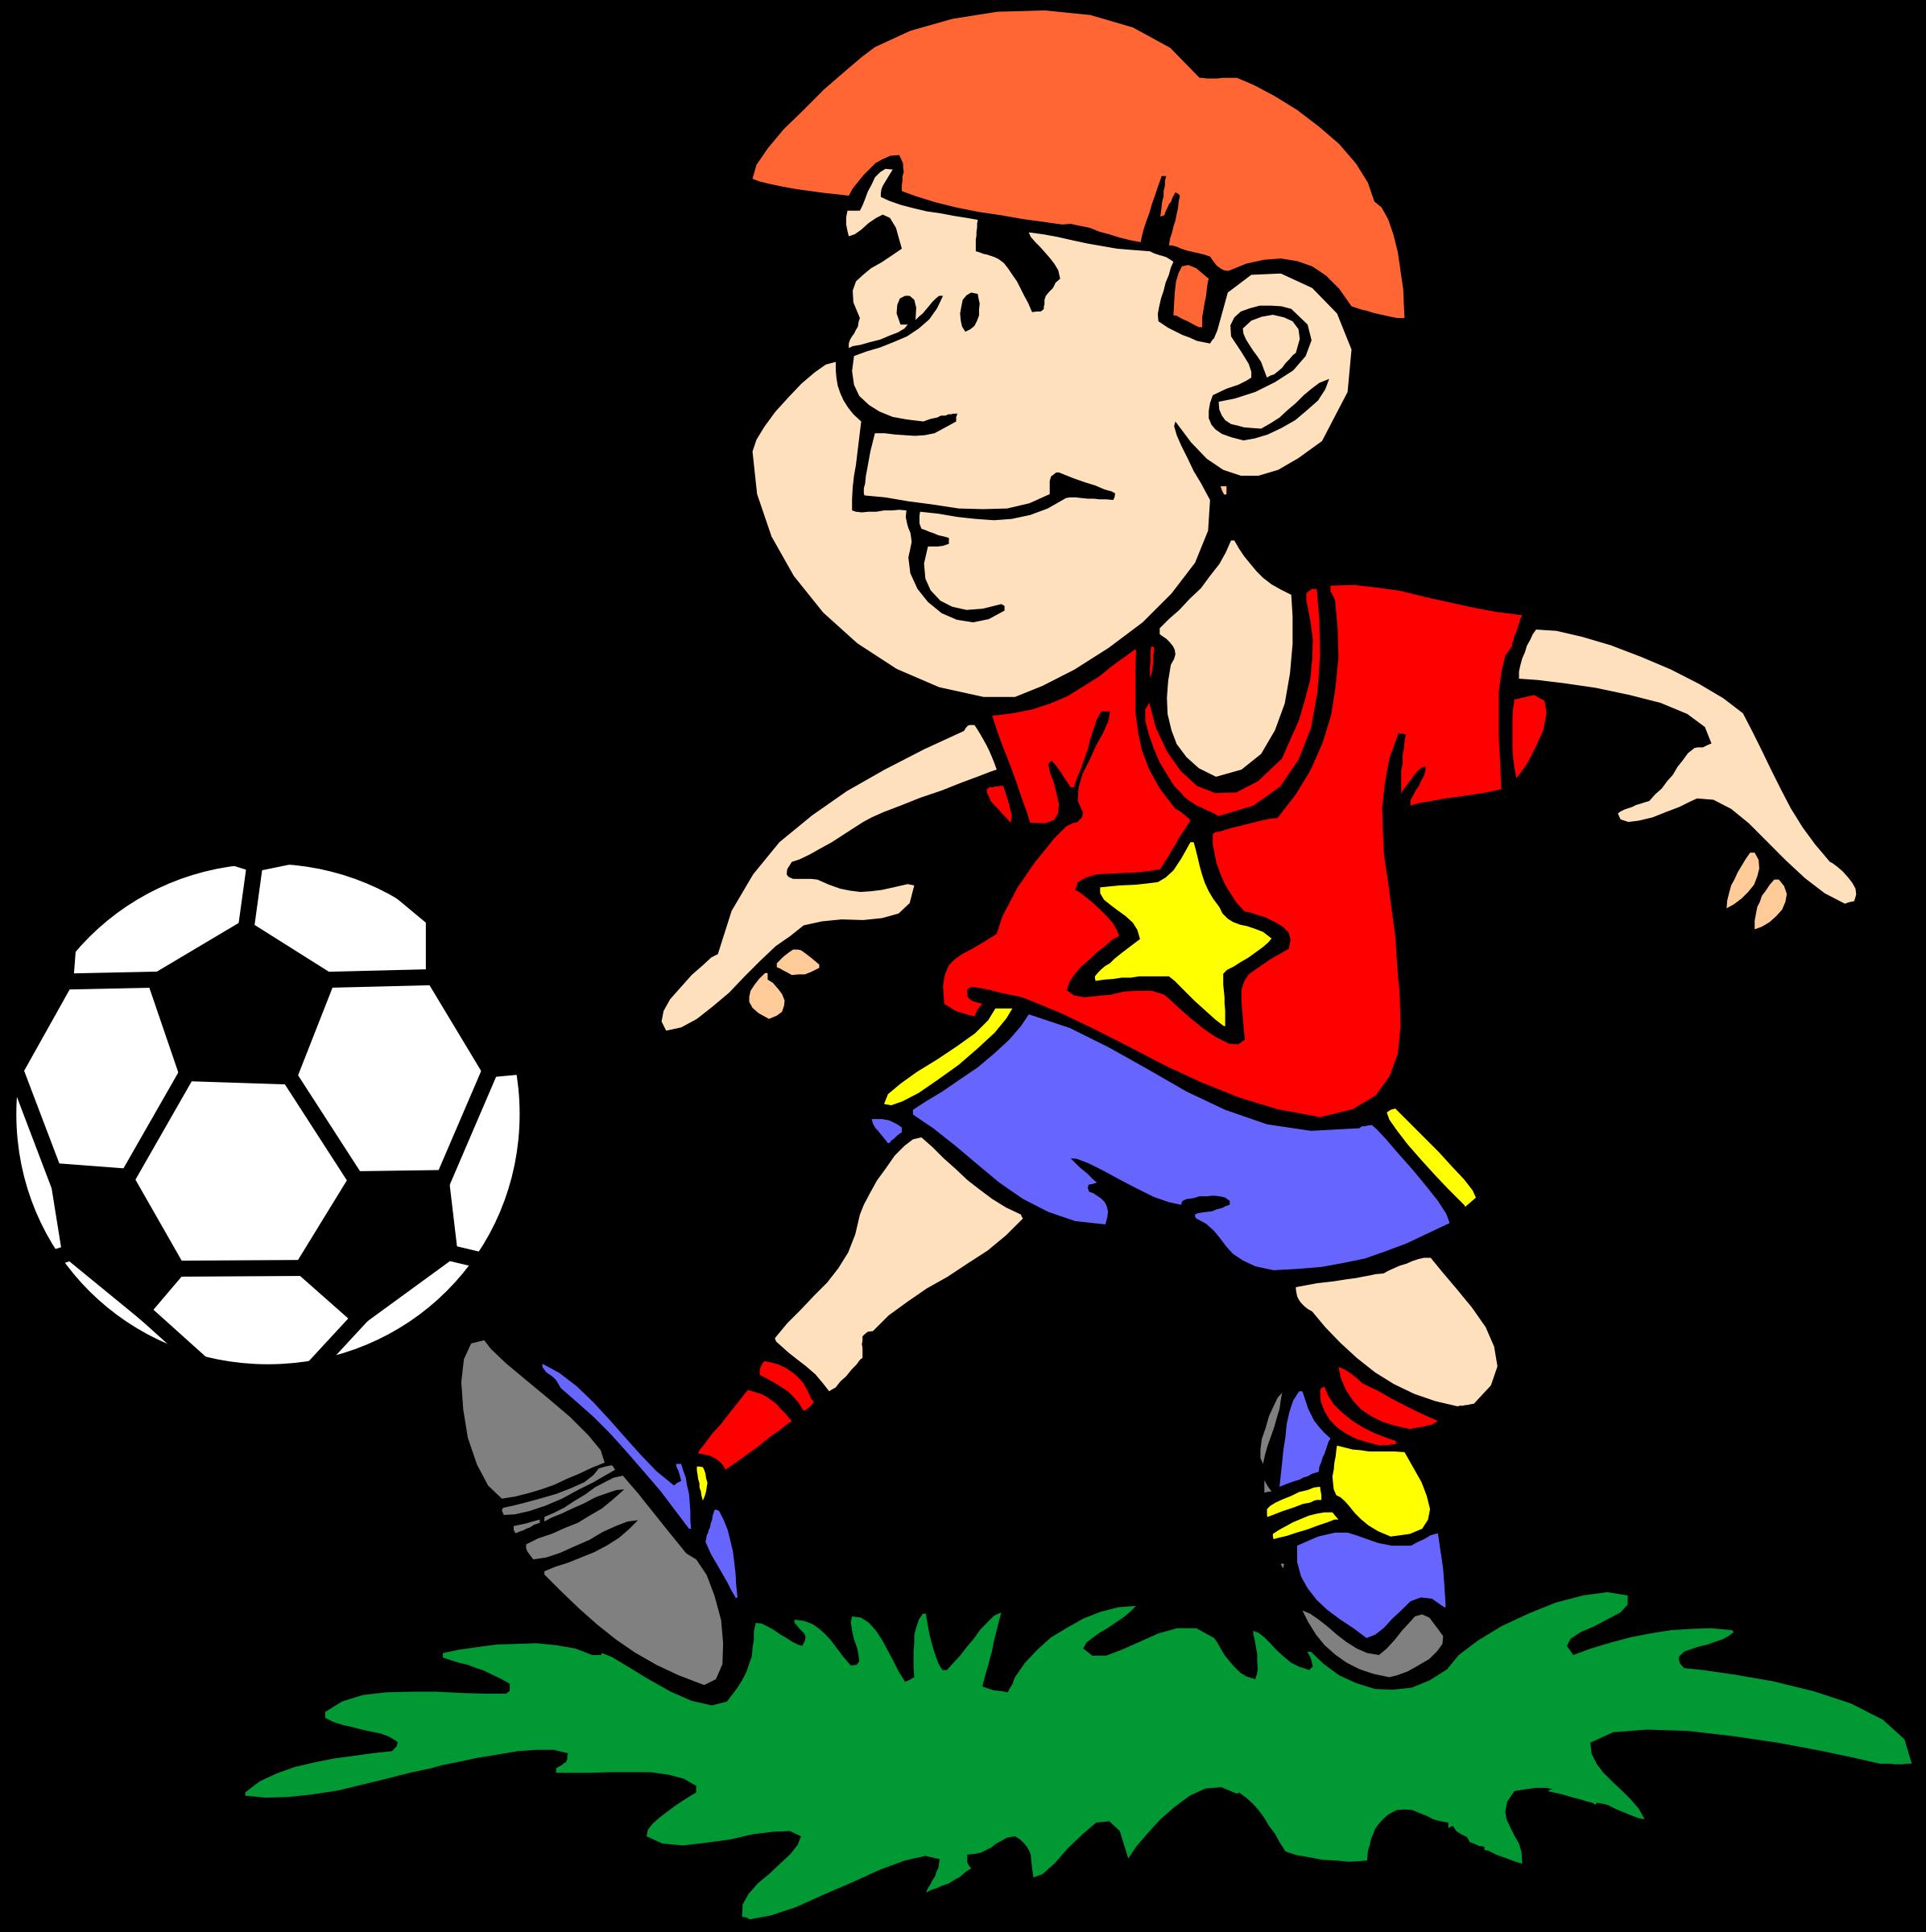 Kicking ball clipart vector library download Kicking a ball clipart clipart images gallery for free download ... vector library download